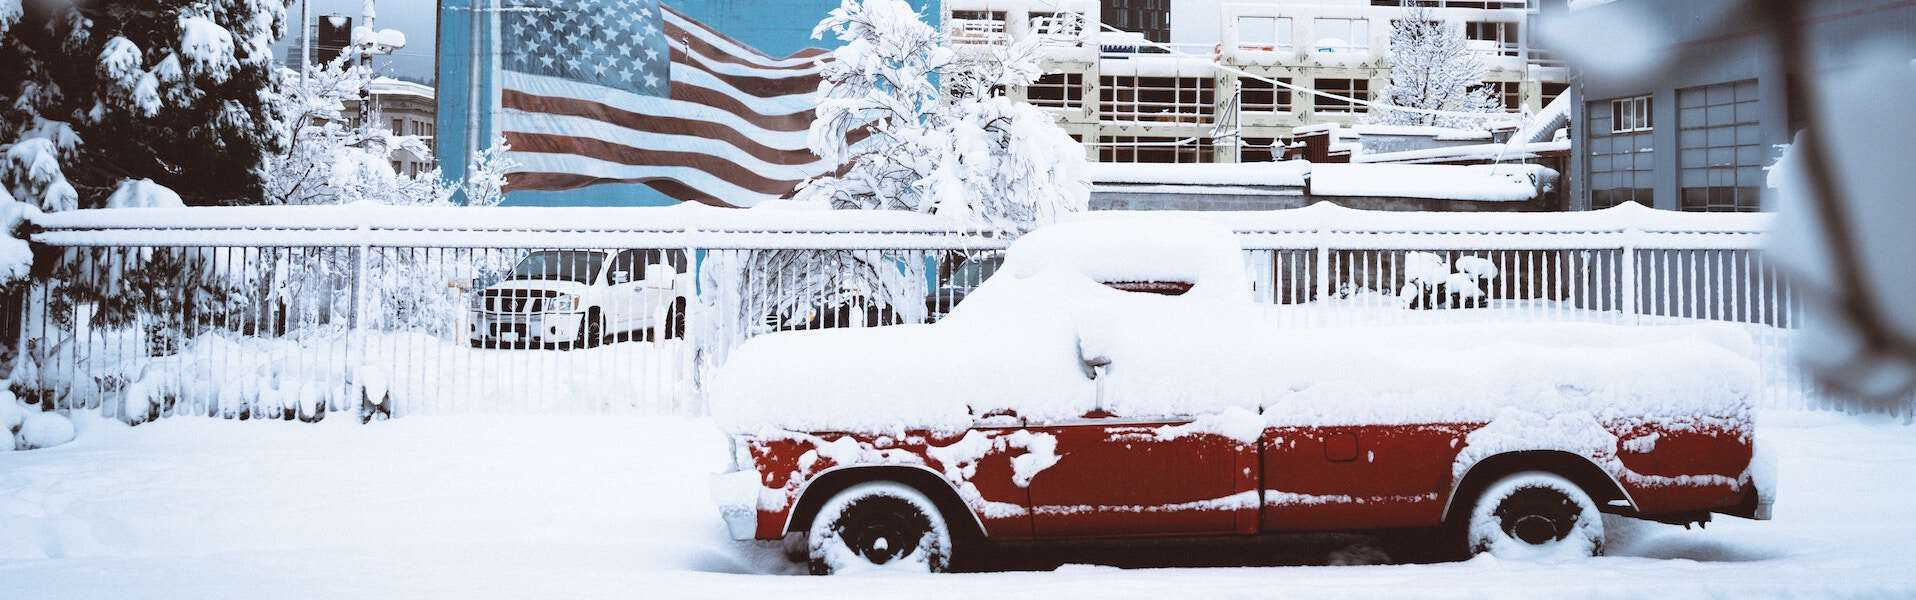 american urban city winter blight city